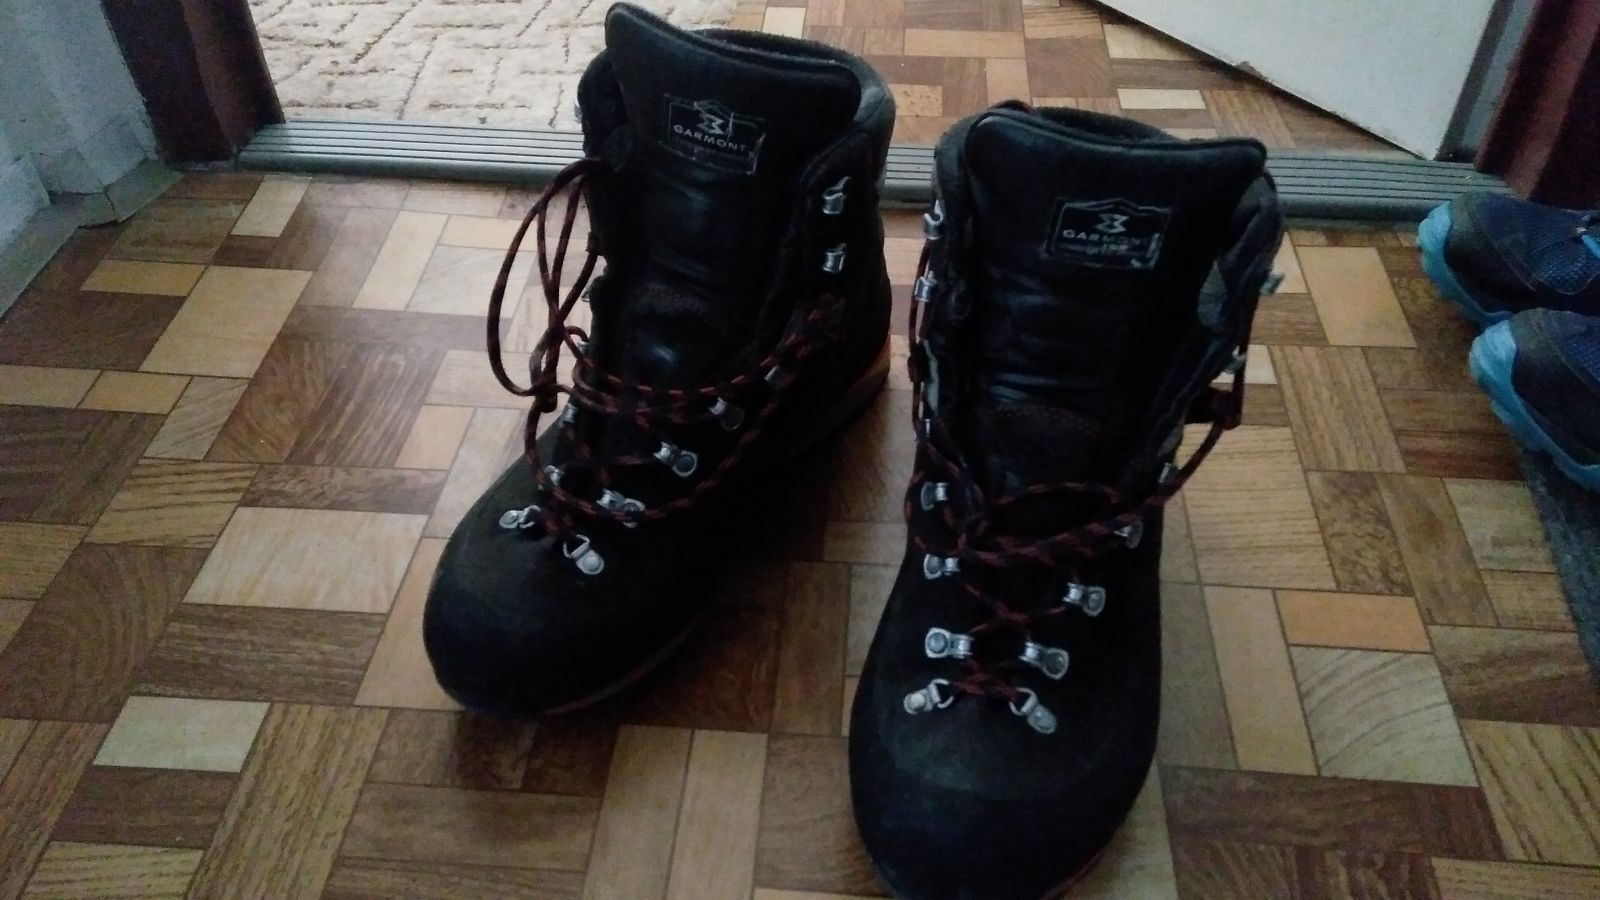 Recenzovaný produkt nájdeš na tejto adrese   https   www.adamsport.eu panska-vysoka-turisticka-obuv garmont-pinnacle -x-lite-gtx  b9de56fbc23